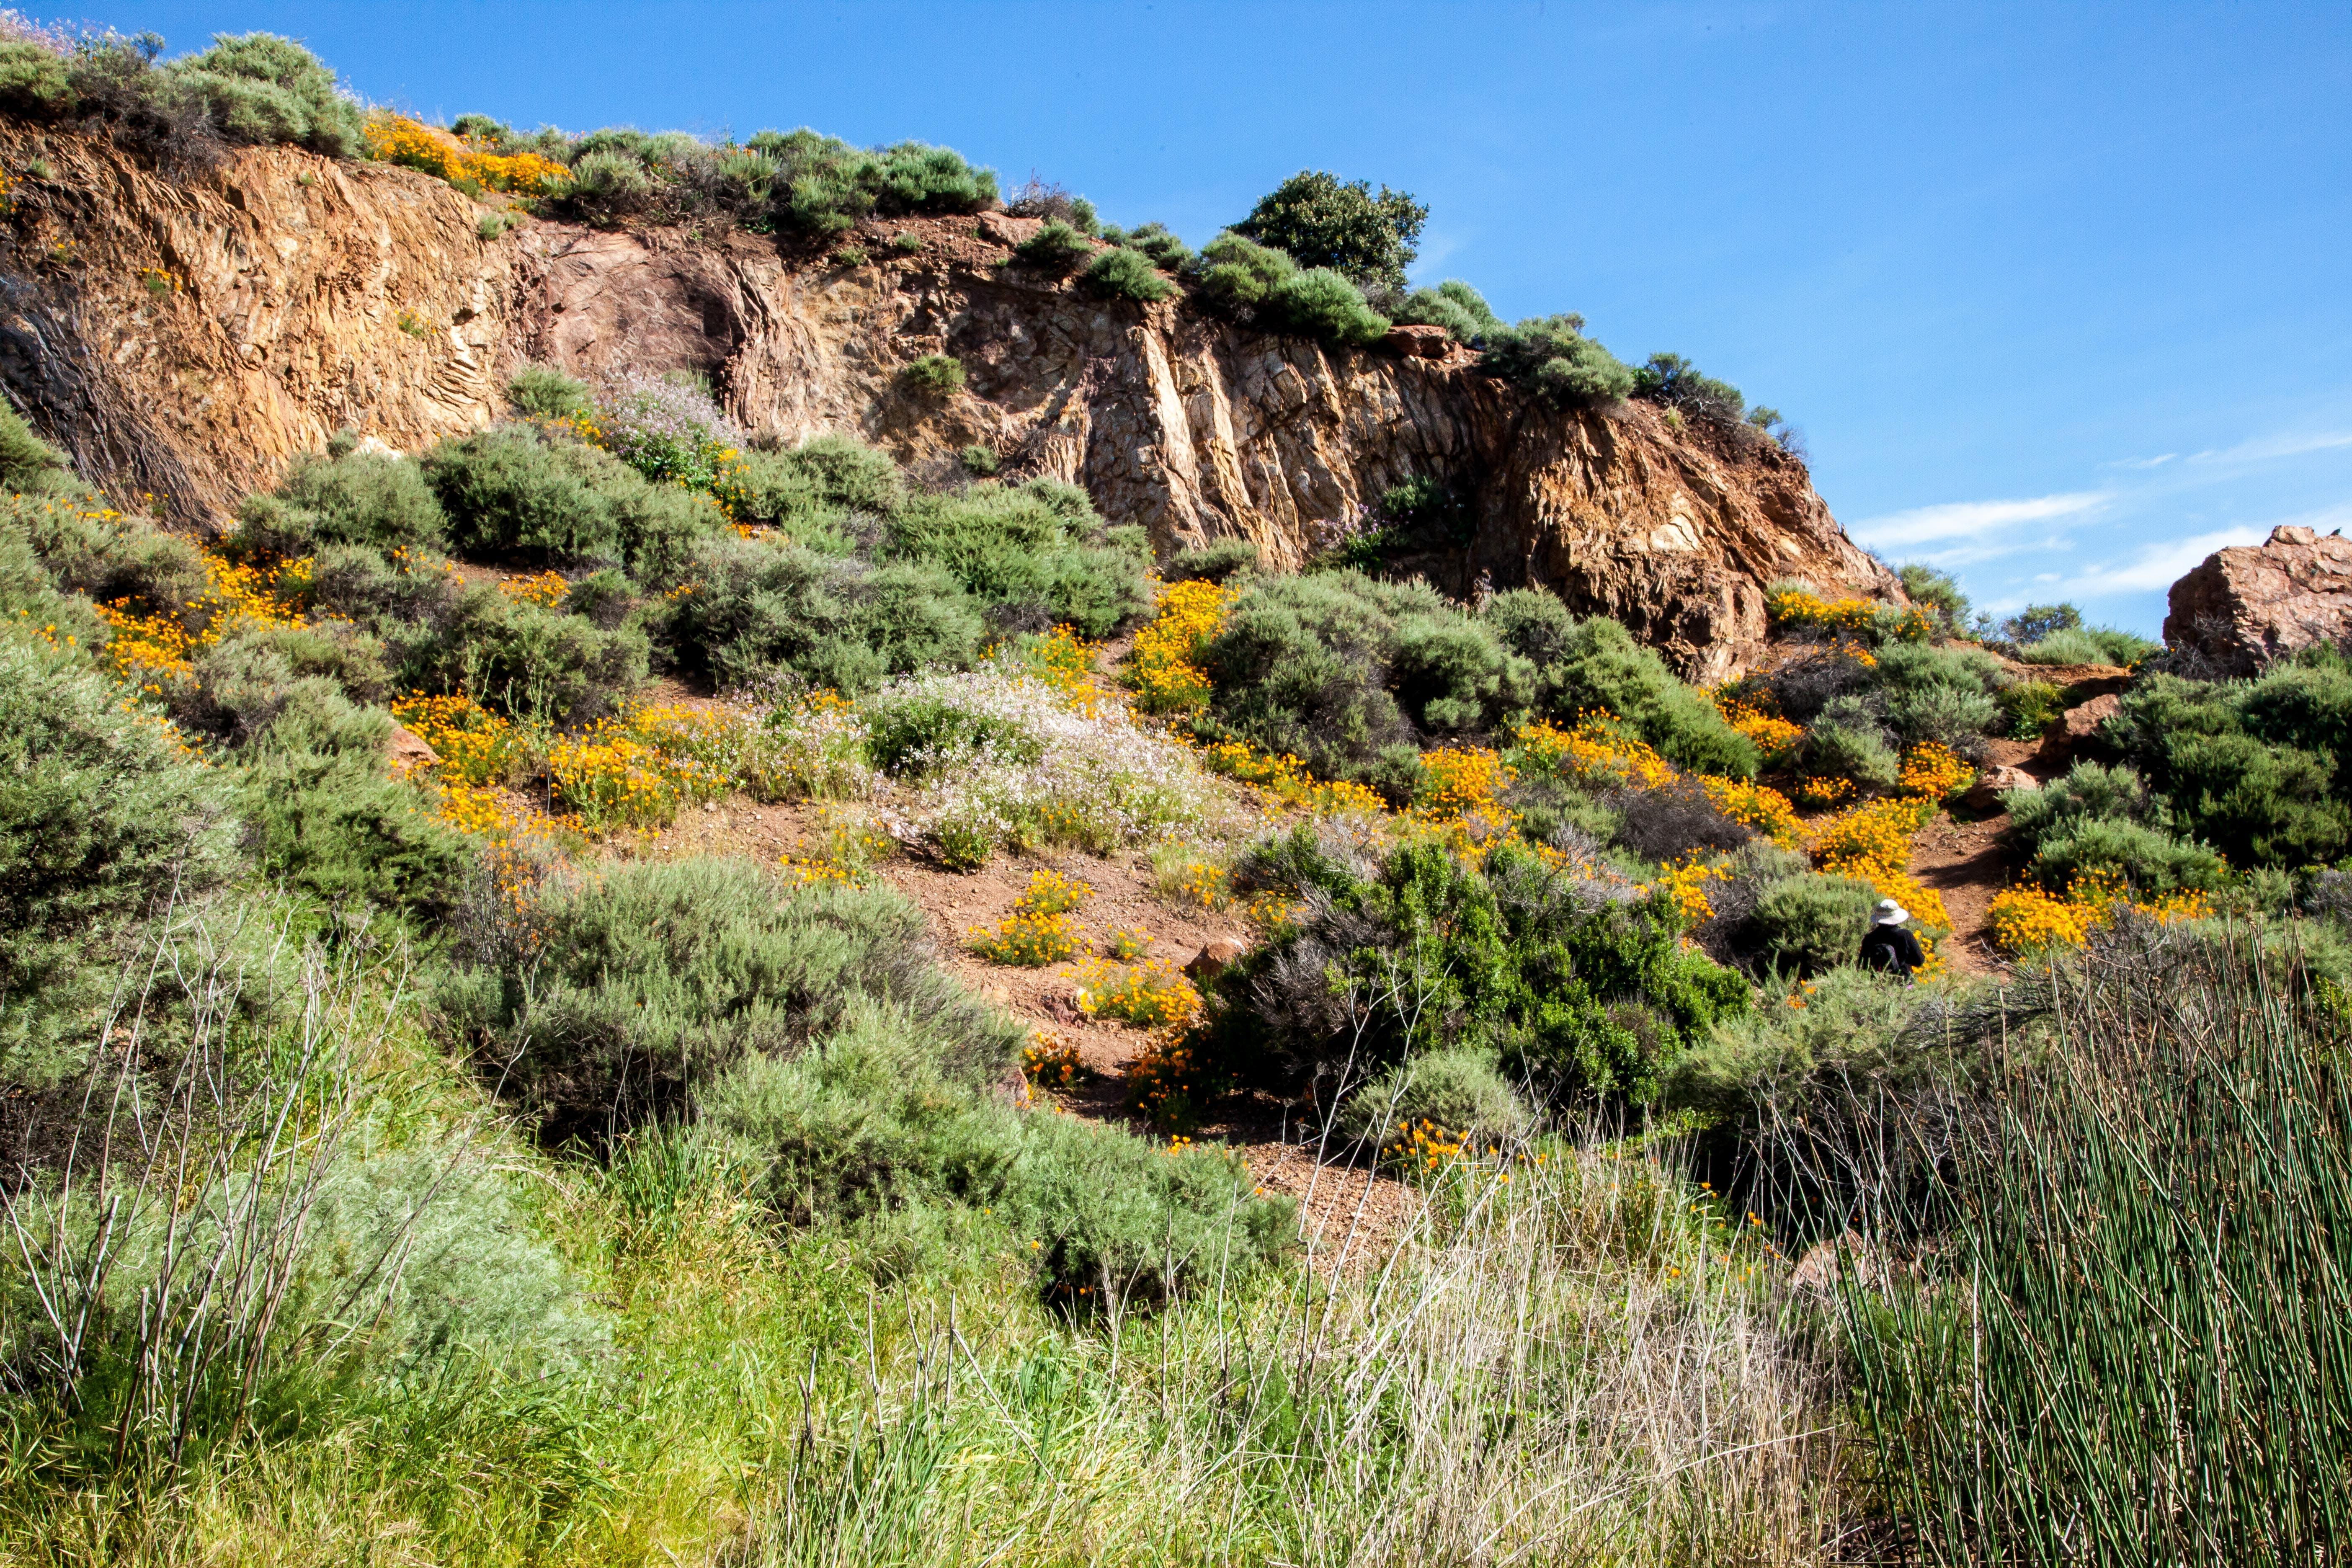 bush, cliff, daylight